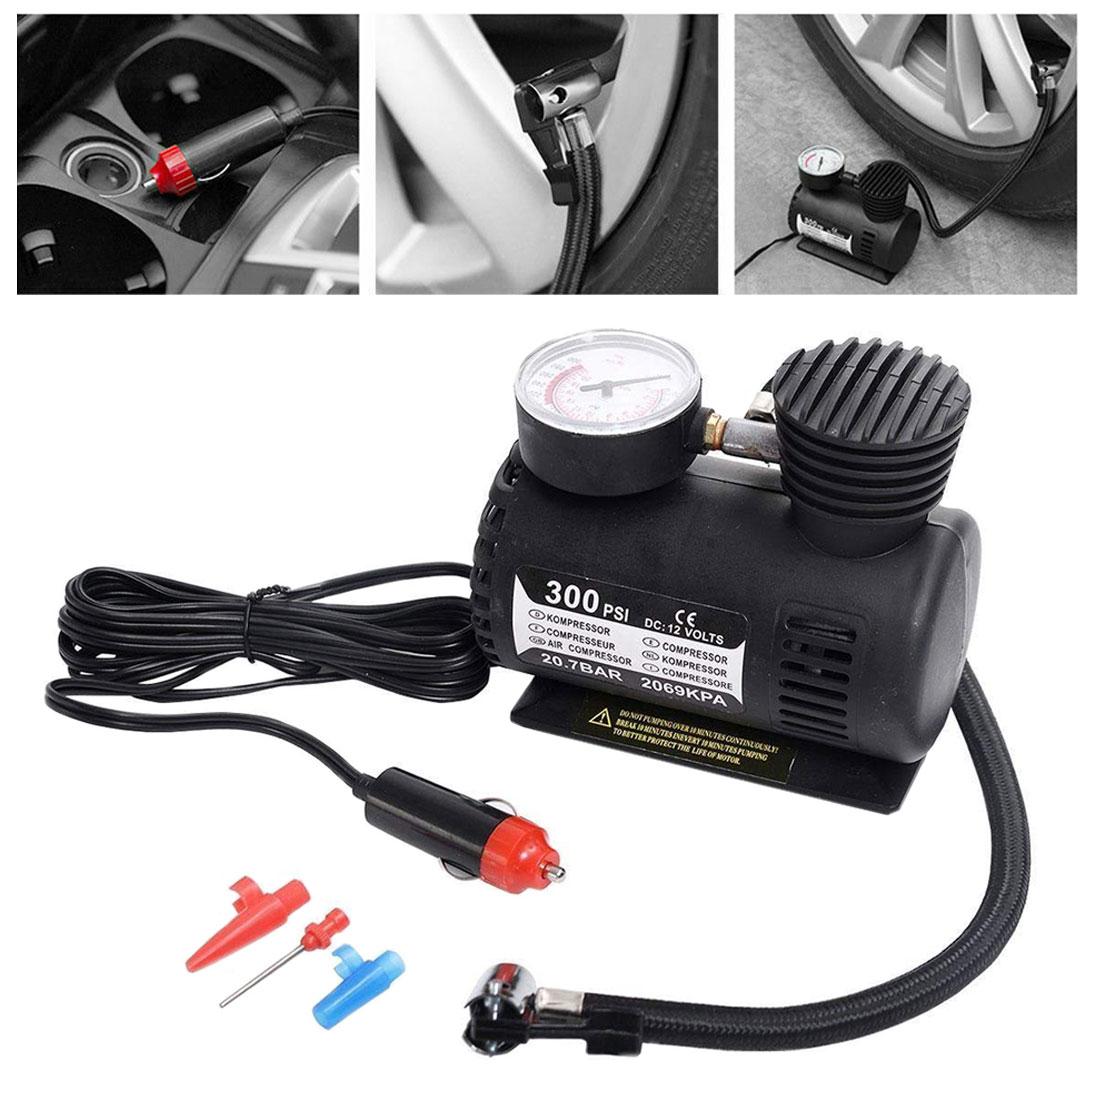 ABS Automotive Durable Vehicle Mini Air Compressor 300 PSI Tire Inflator Pump DC 12V Car Parts Car Accessories